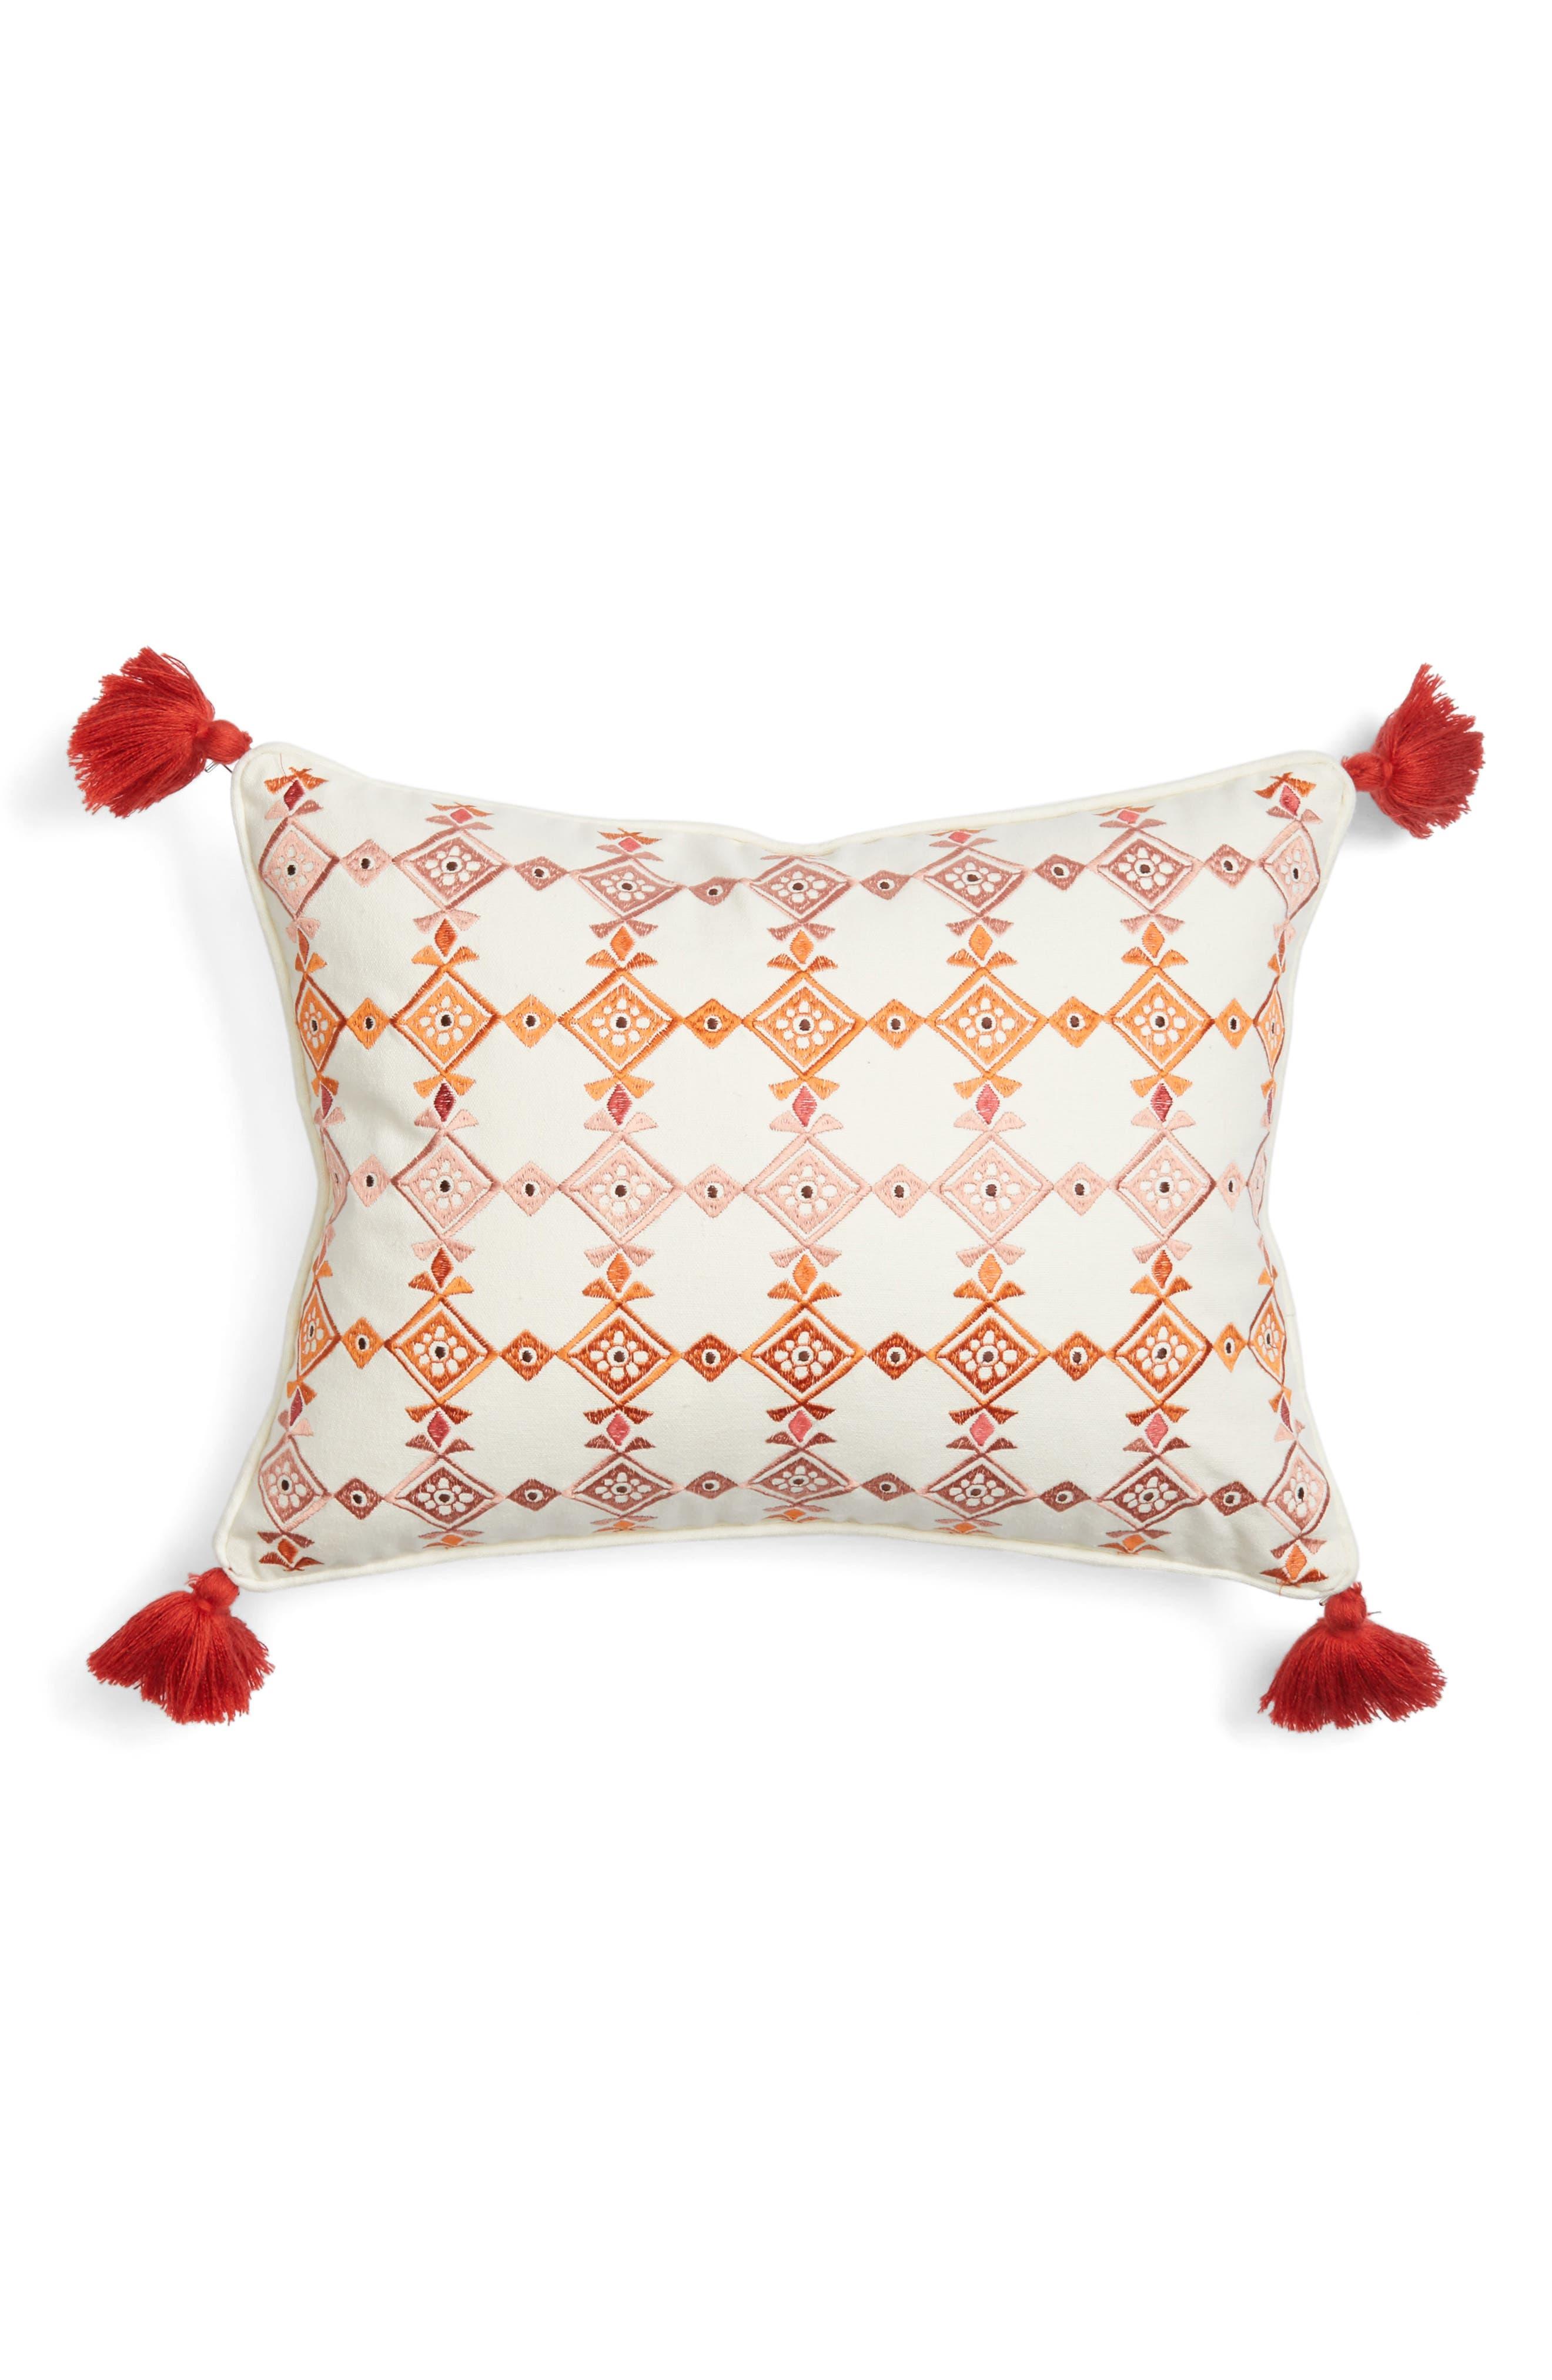 Piper Tassel Pillow,                             Main thumbnail 1, color,                             Red/ Multi